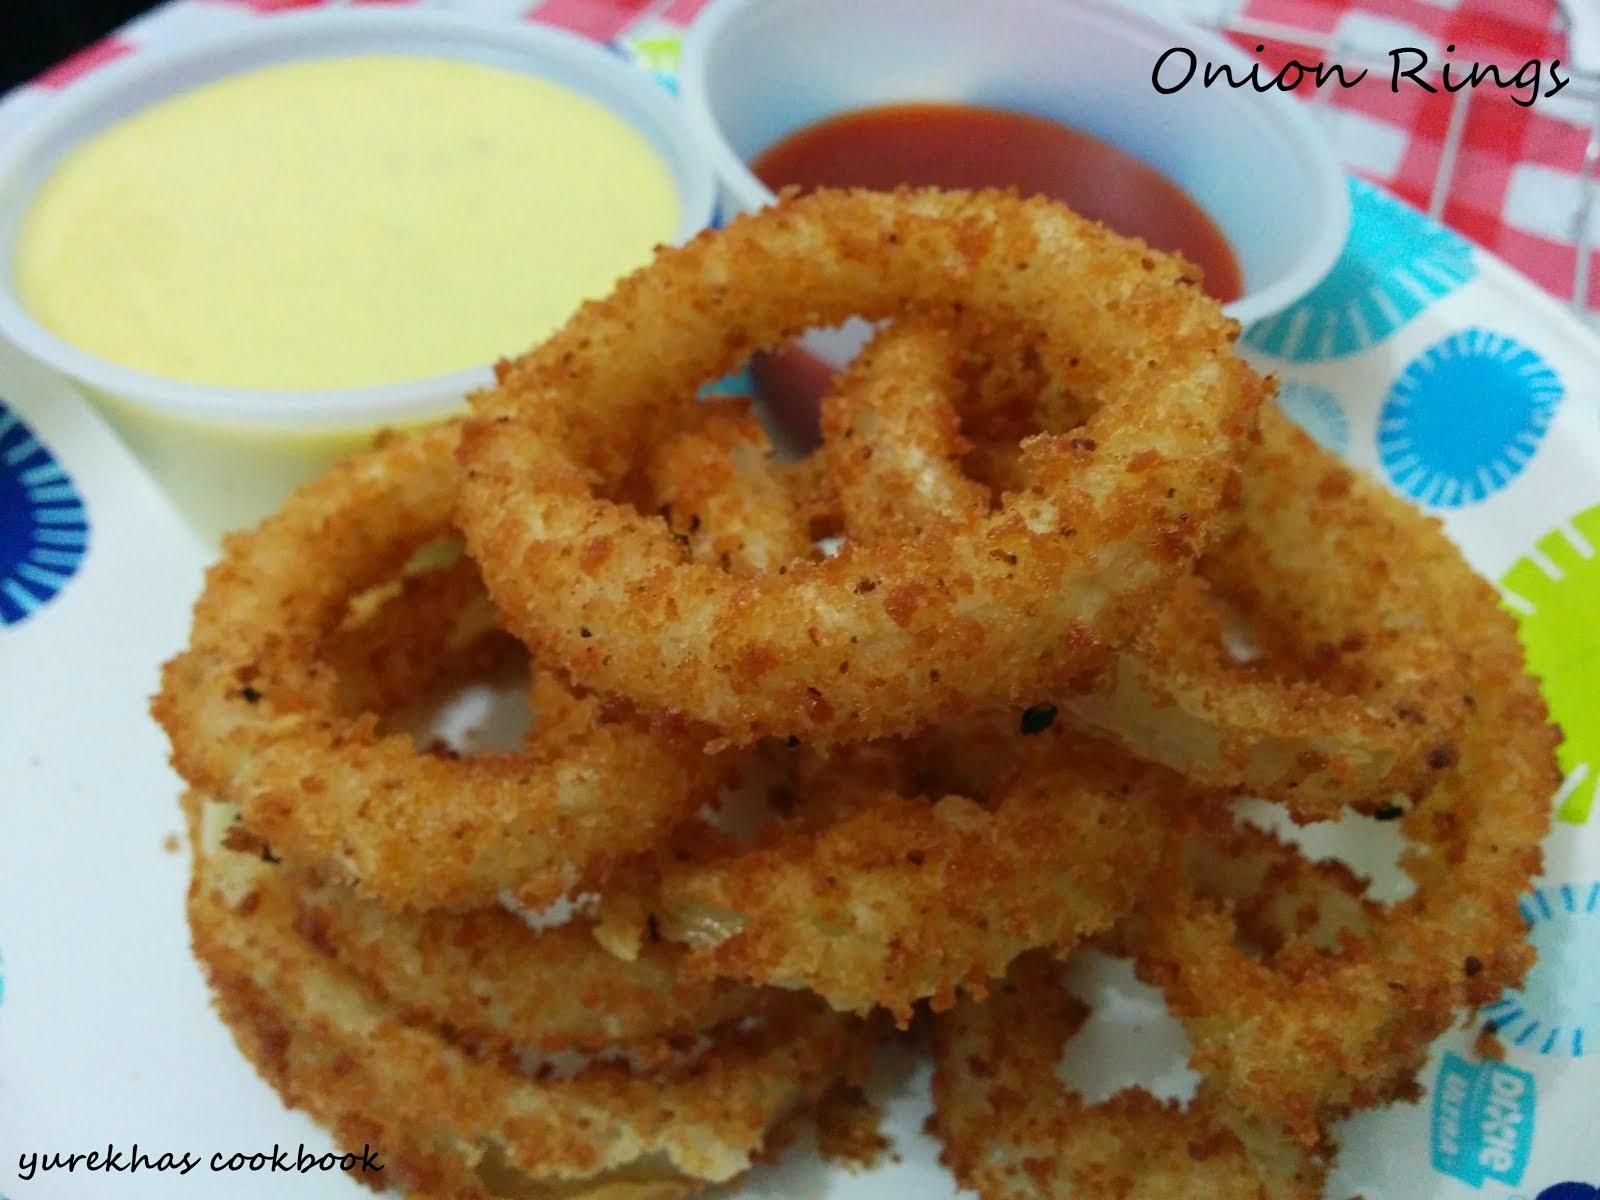 Onion rings!